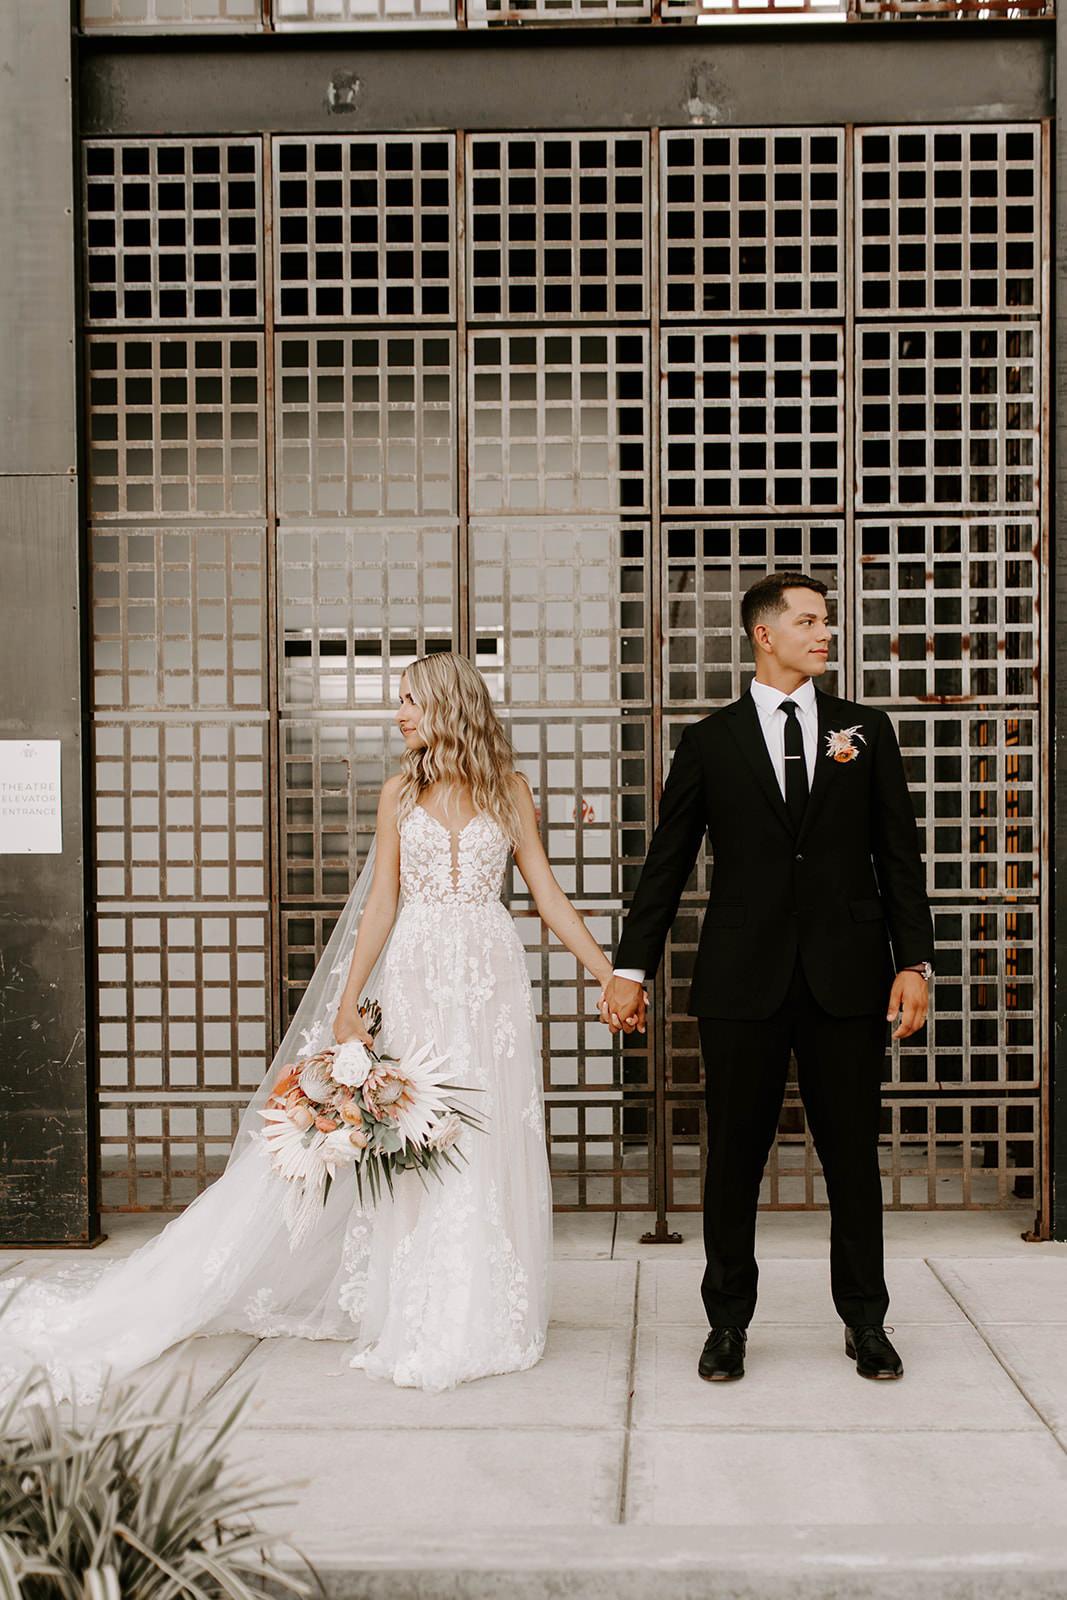 Boho Chic Bride and Groom Holding Hands Wedding Portrait